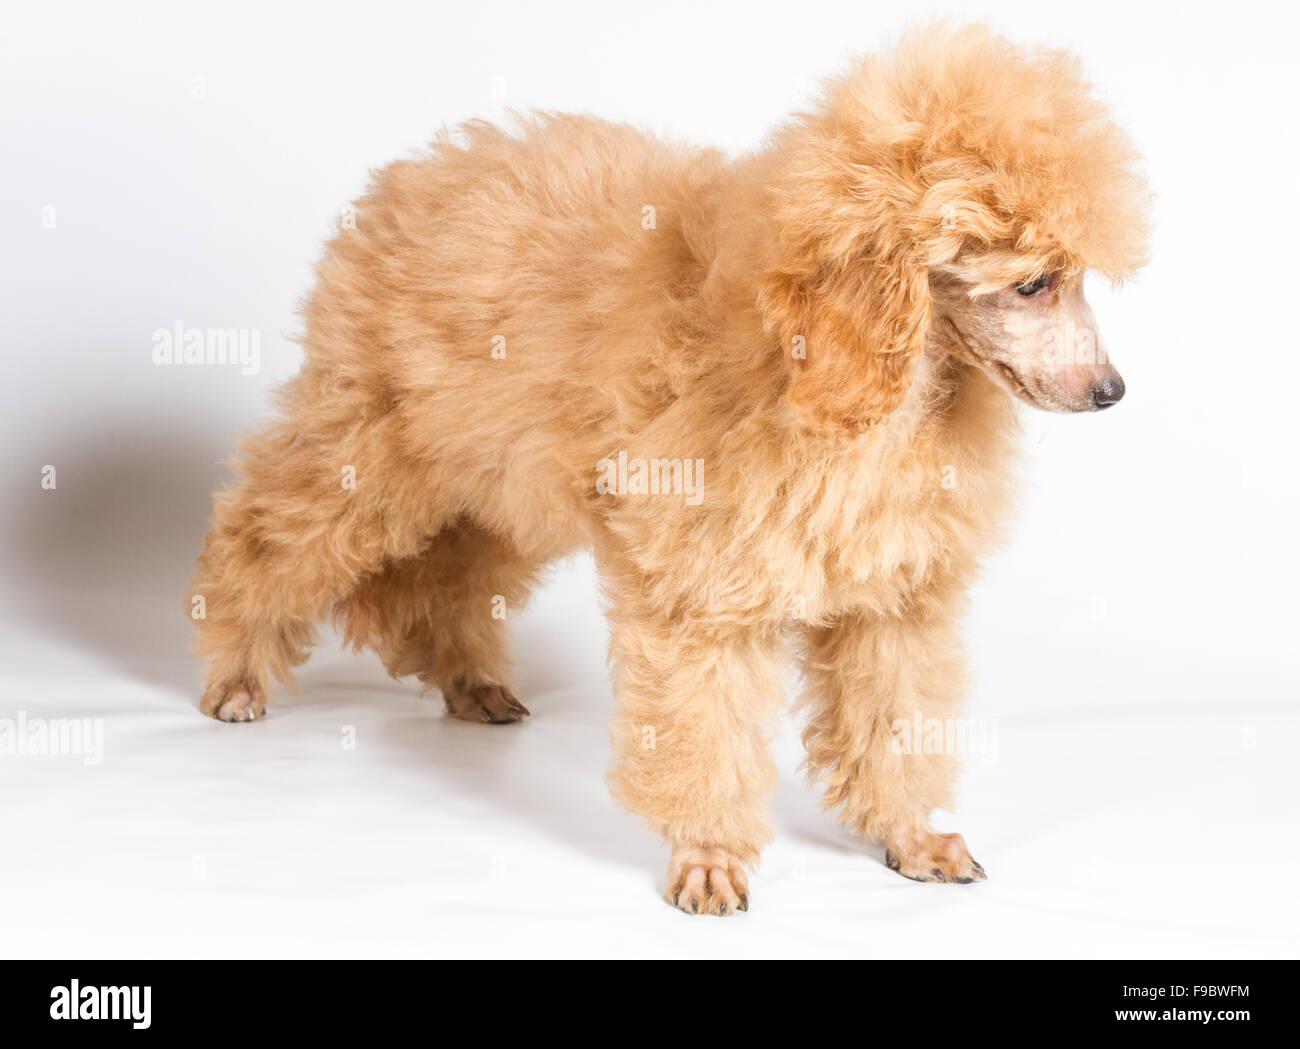 Apricot Poodle Puppy Portrait On A White Background Stock Photo Alamy